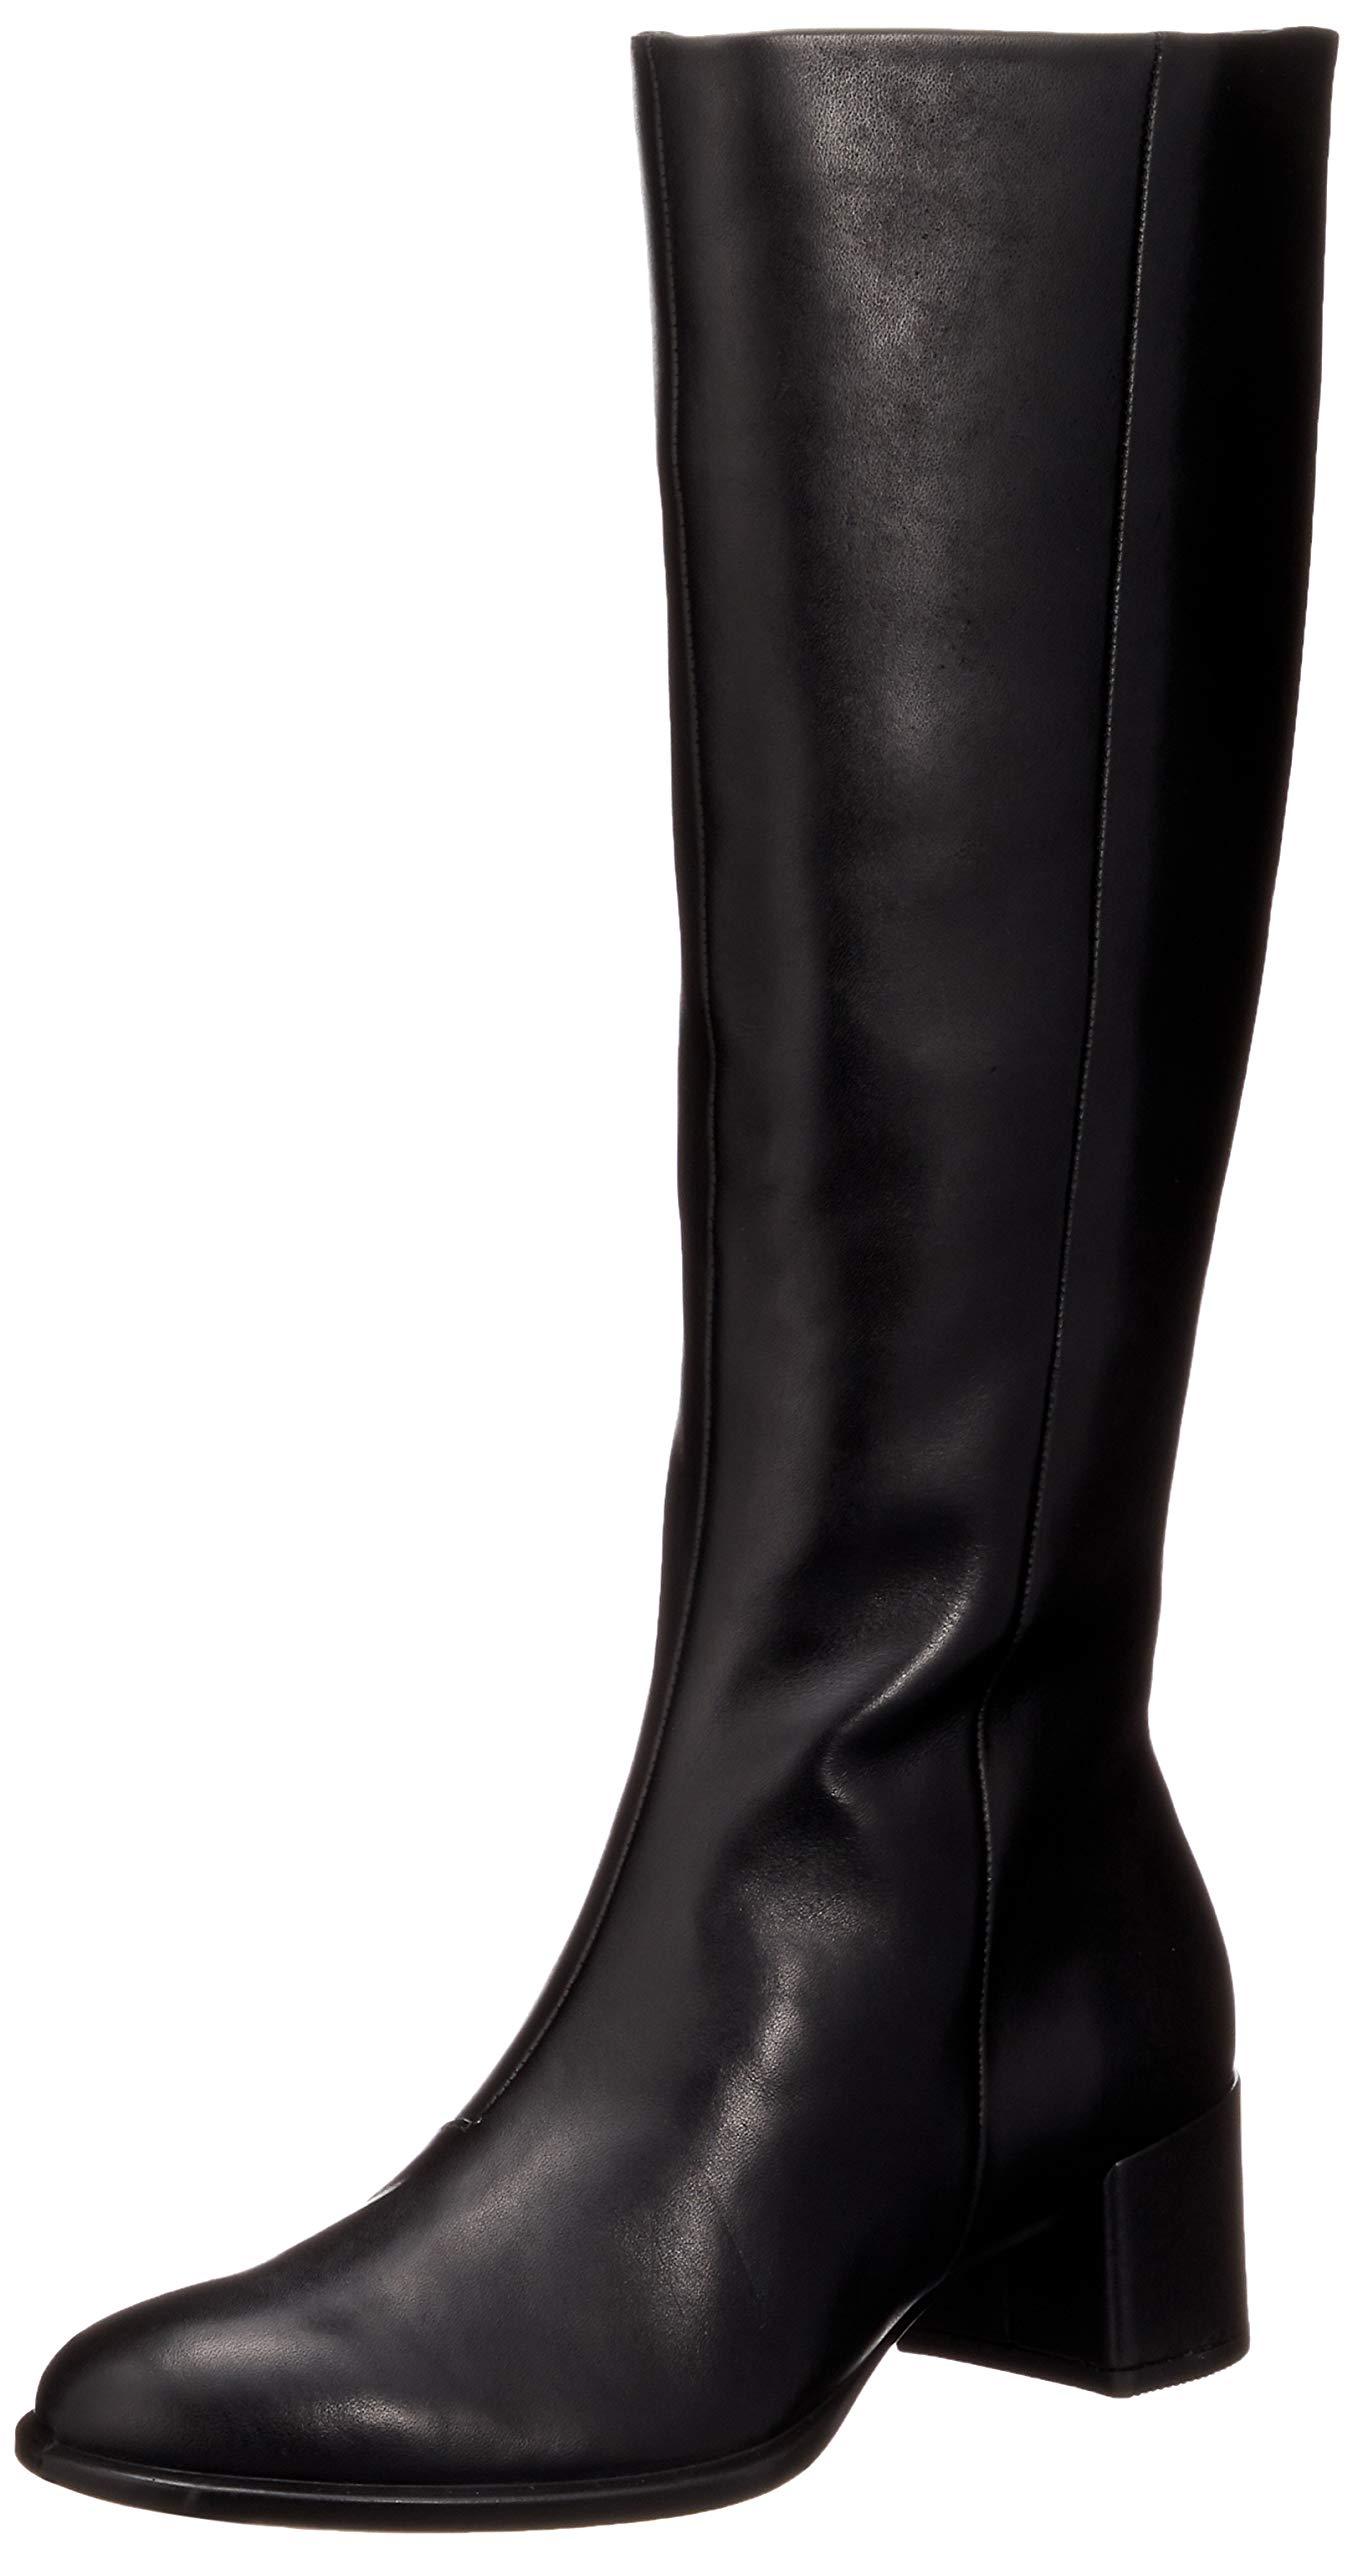 FemmeNoirblack Eu Ecco Block Hautes 35 Tall 100137 BootBottes Shape nOPX0kN8w